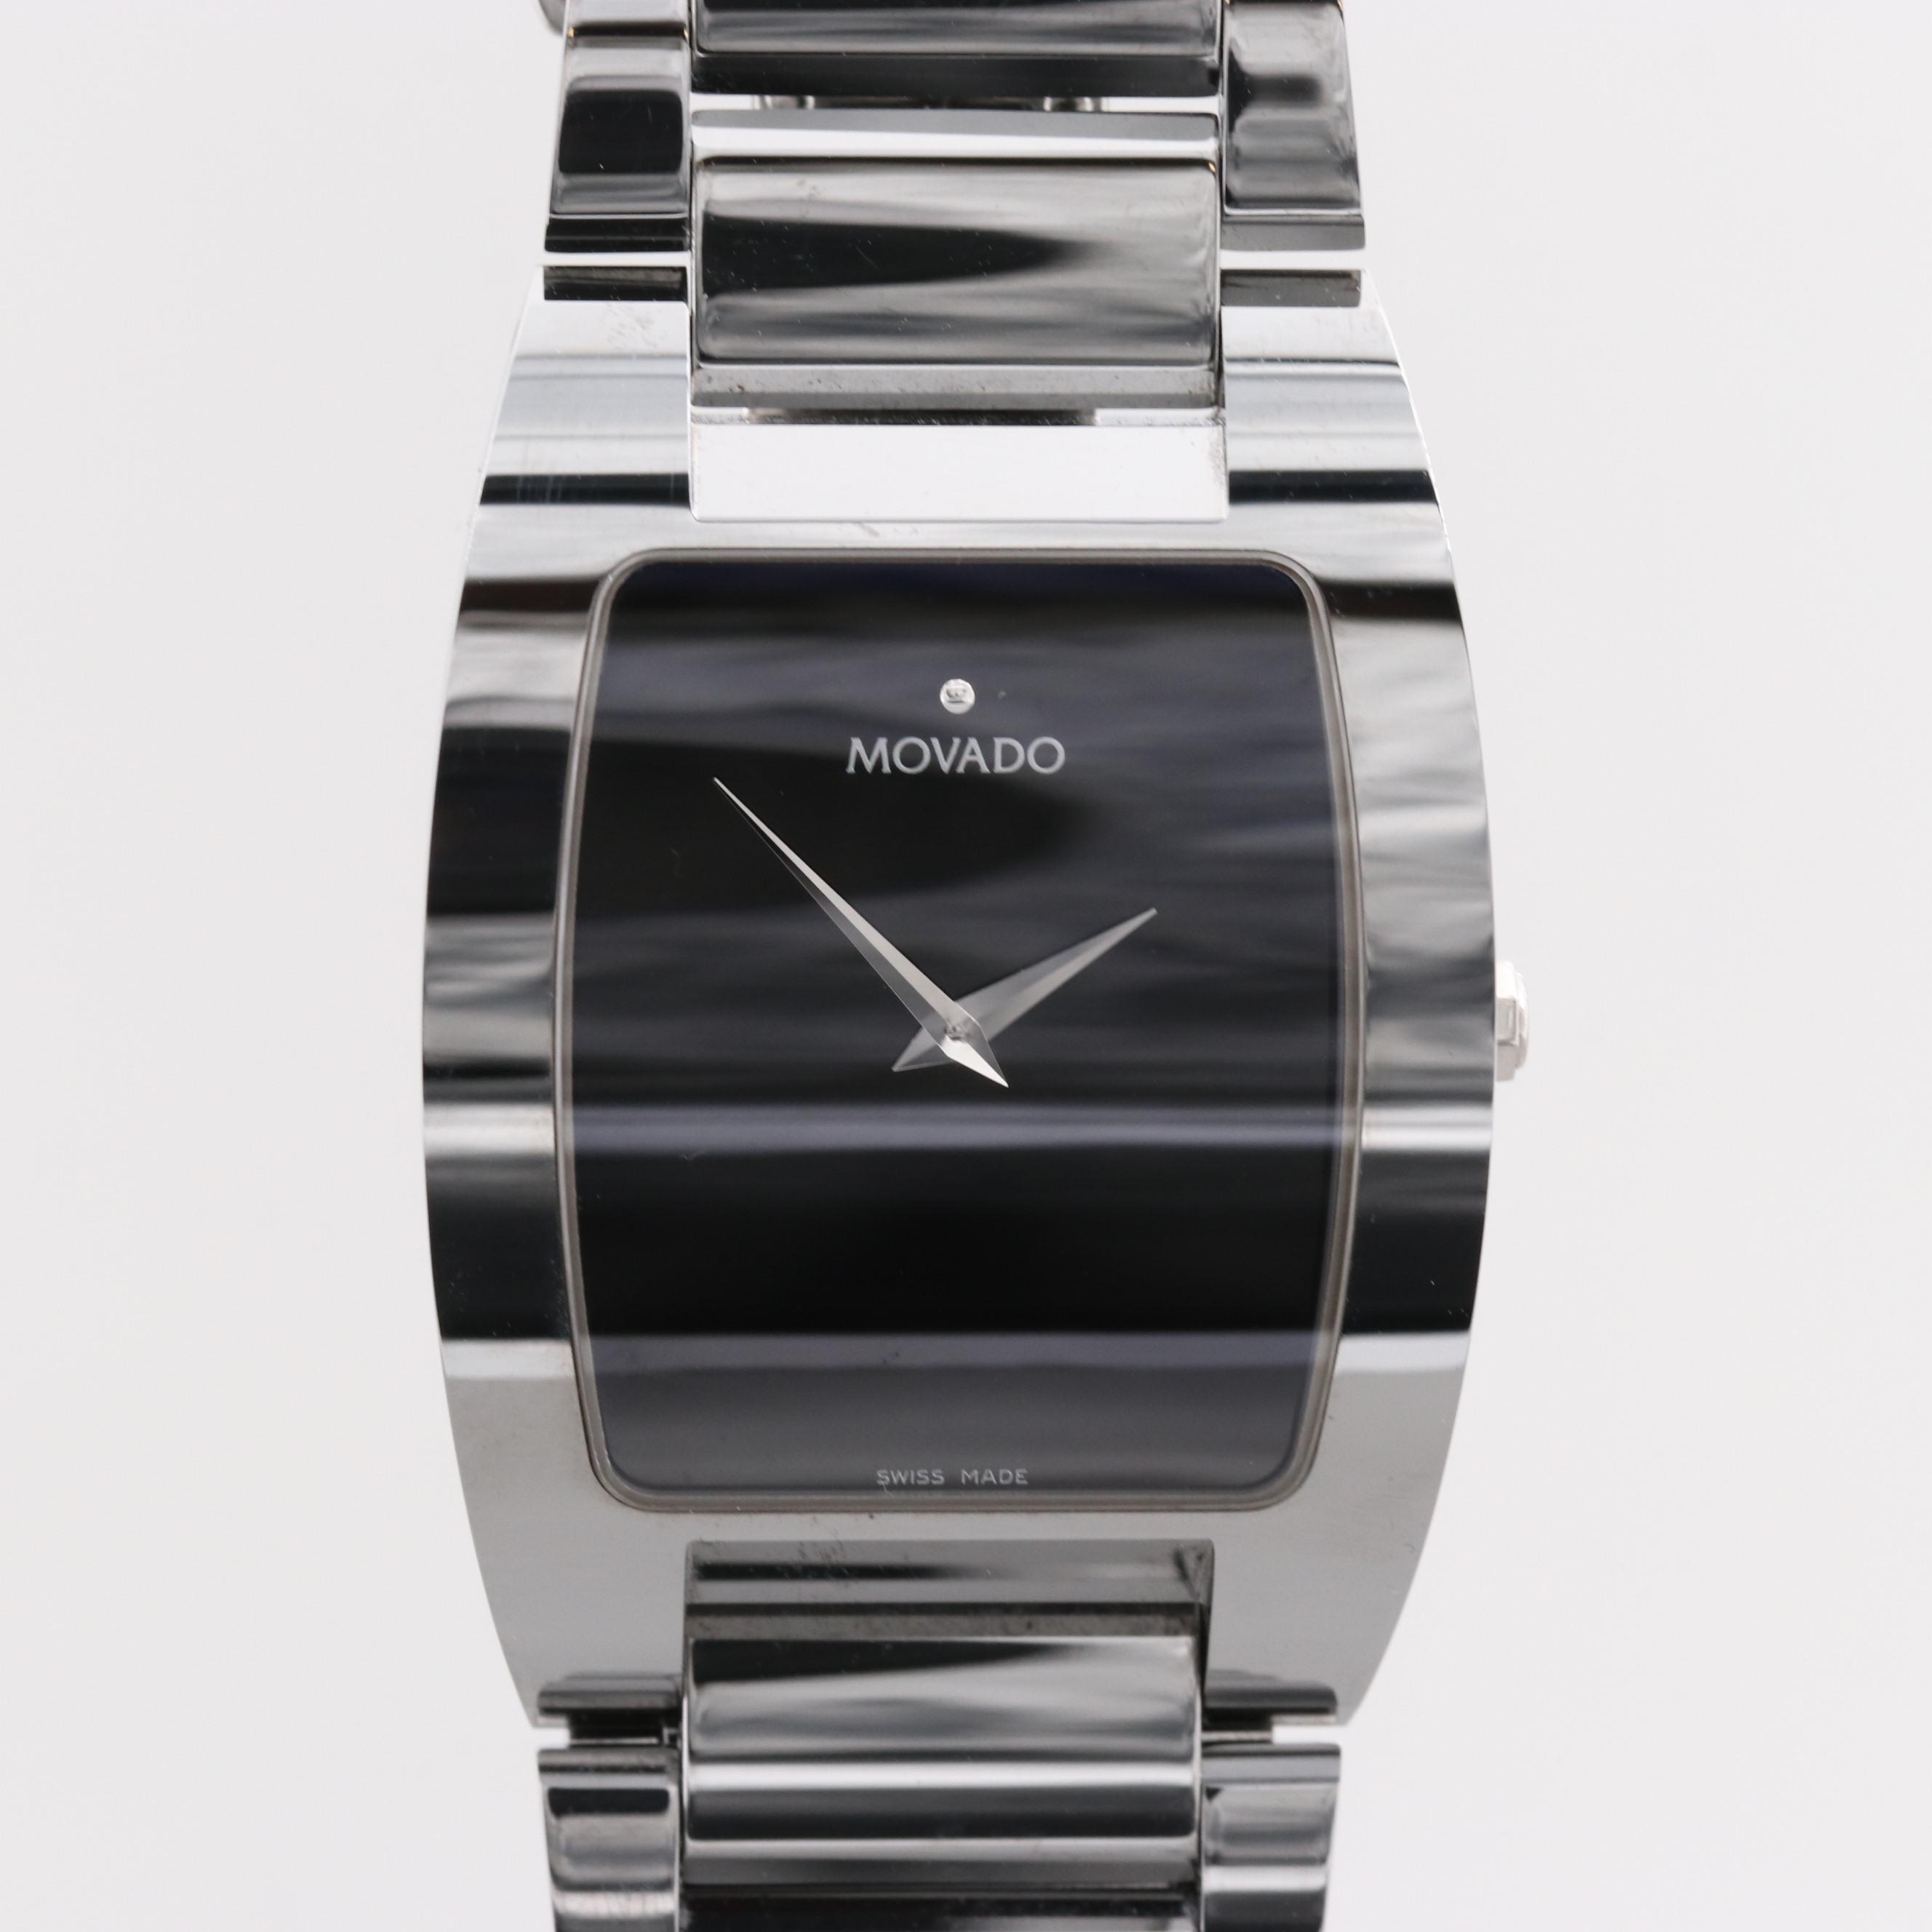 Movado Fiero Tungsten Carbide Quartz Wristwatch